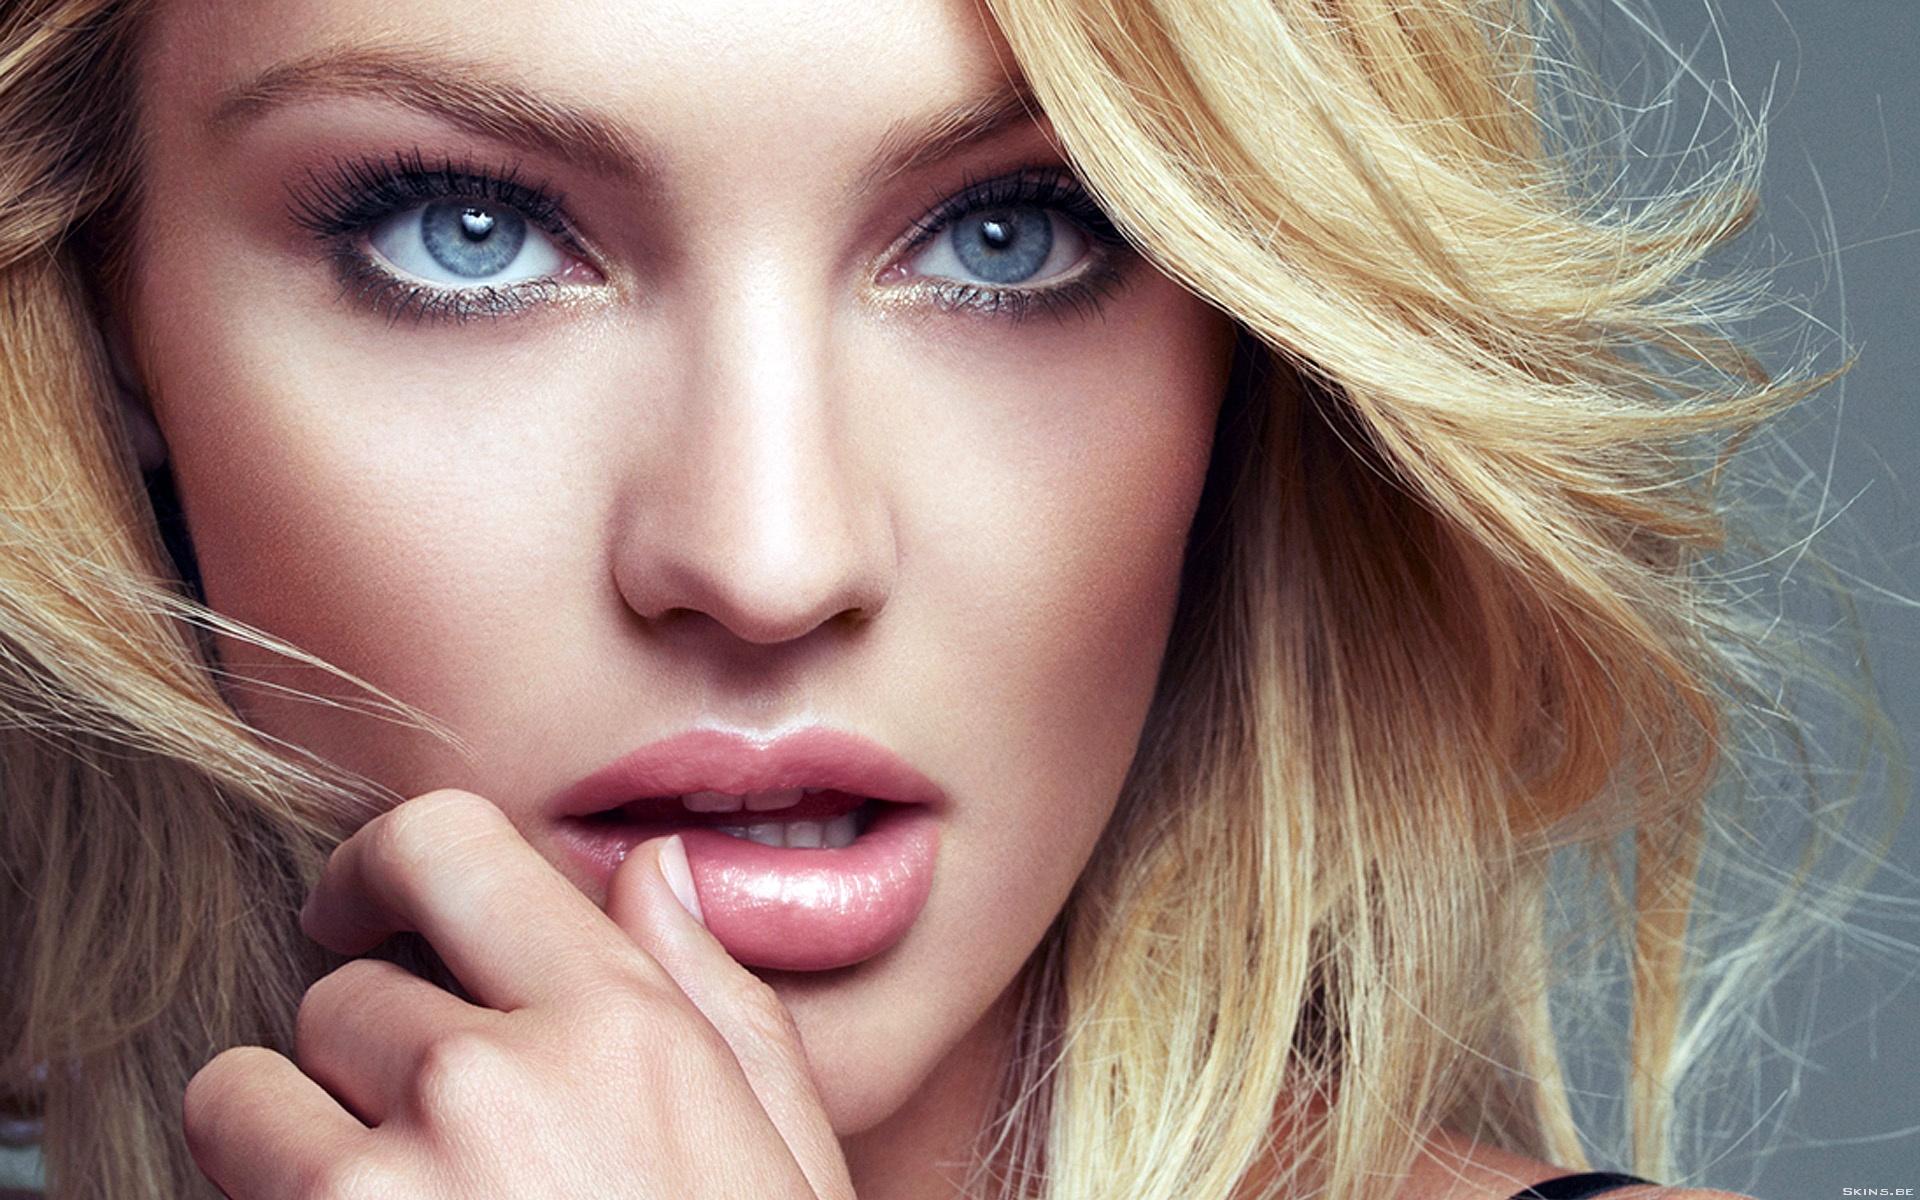 Candice Swanepoel/ქენდის სვეინპოლი - Page 3 Ced35efe0b7f70c12c83dba8fbbddbd9